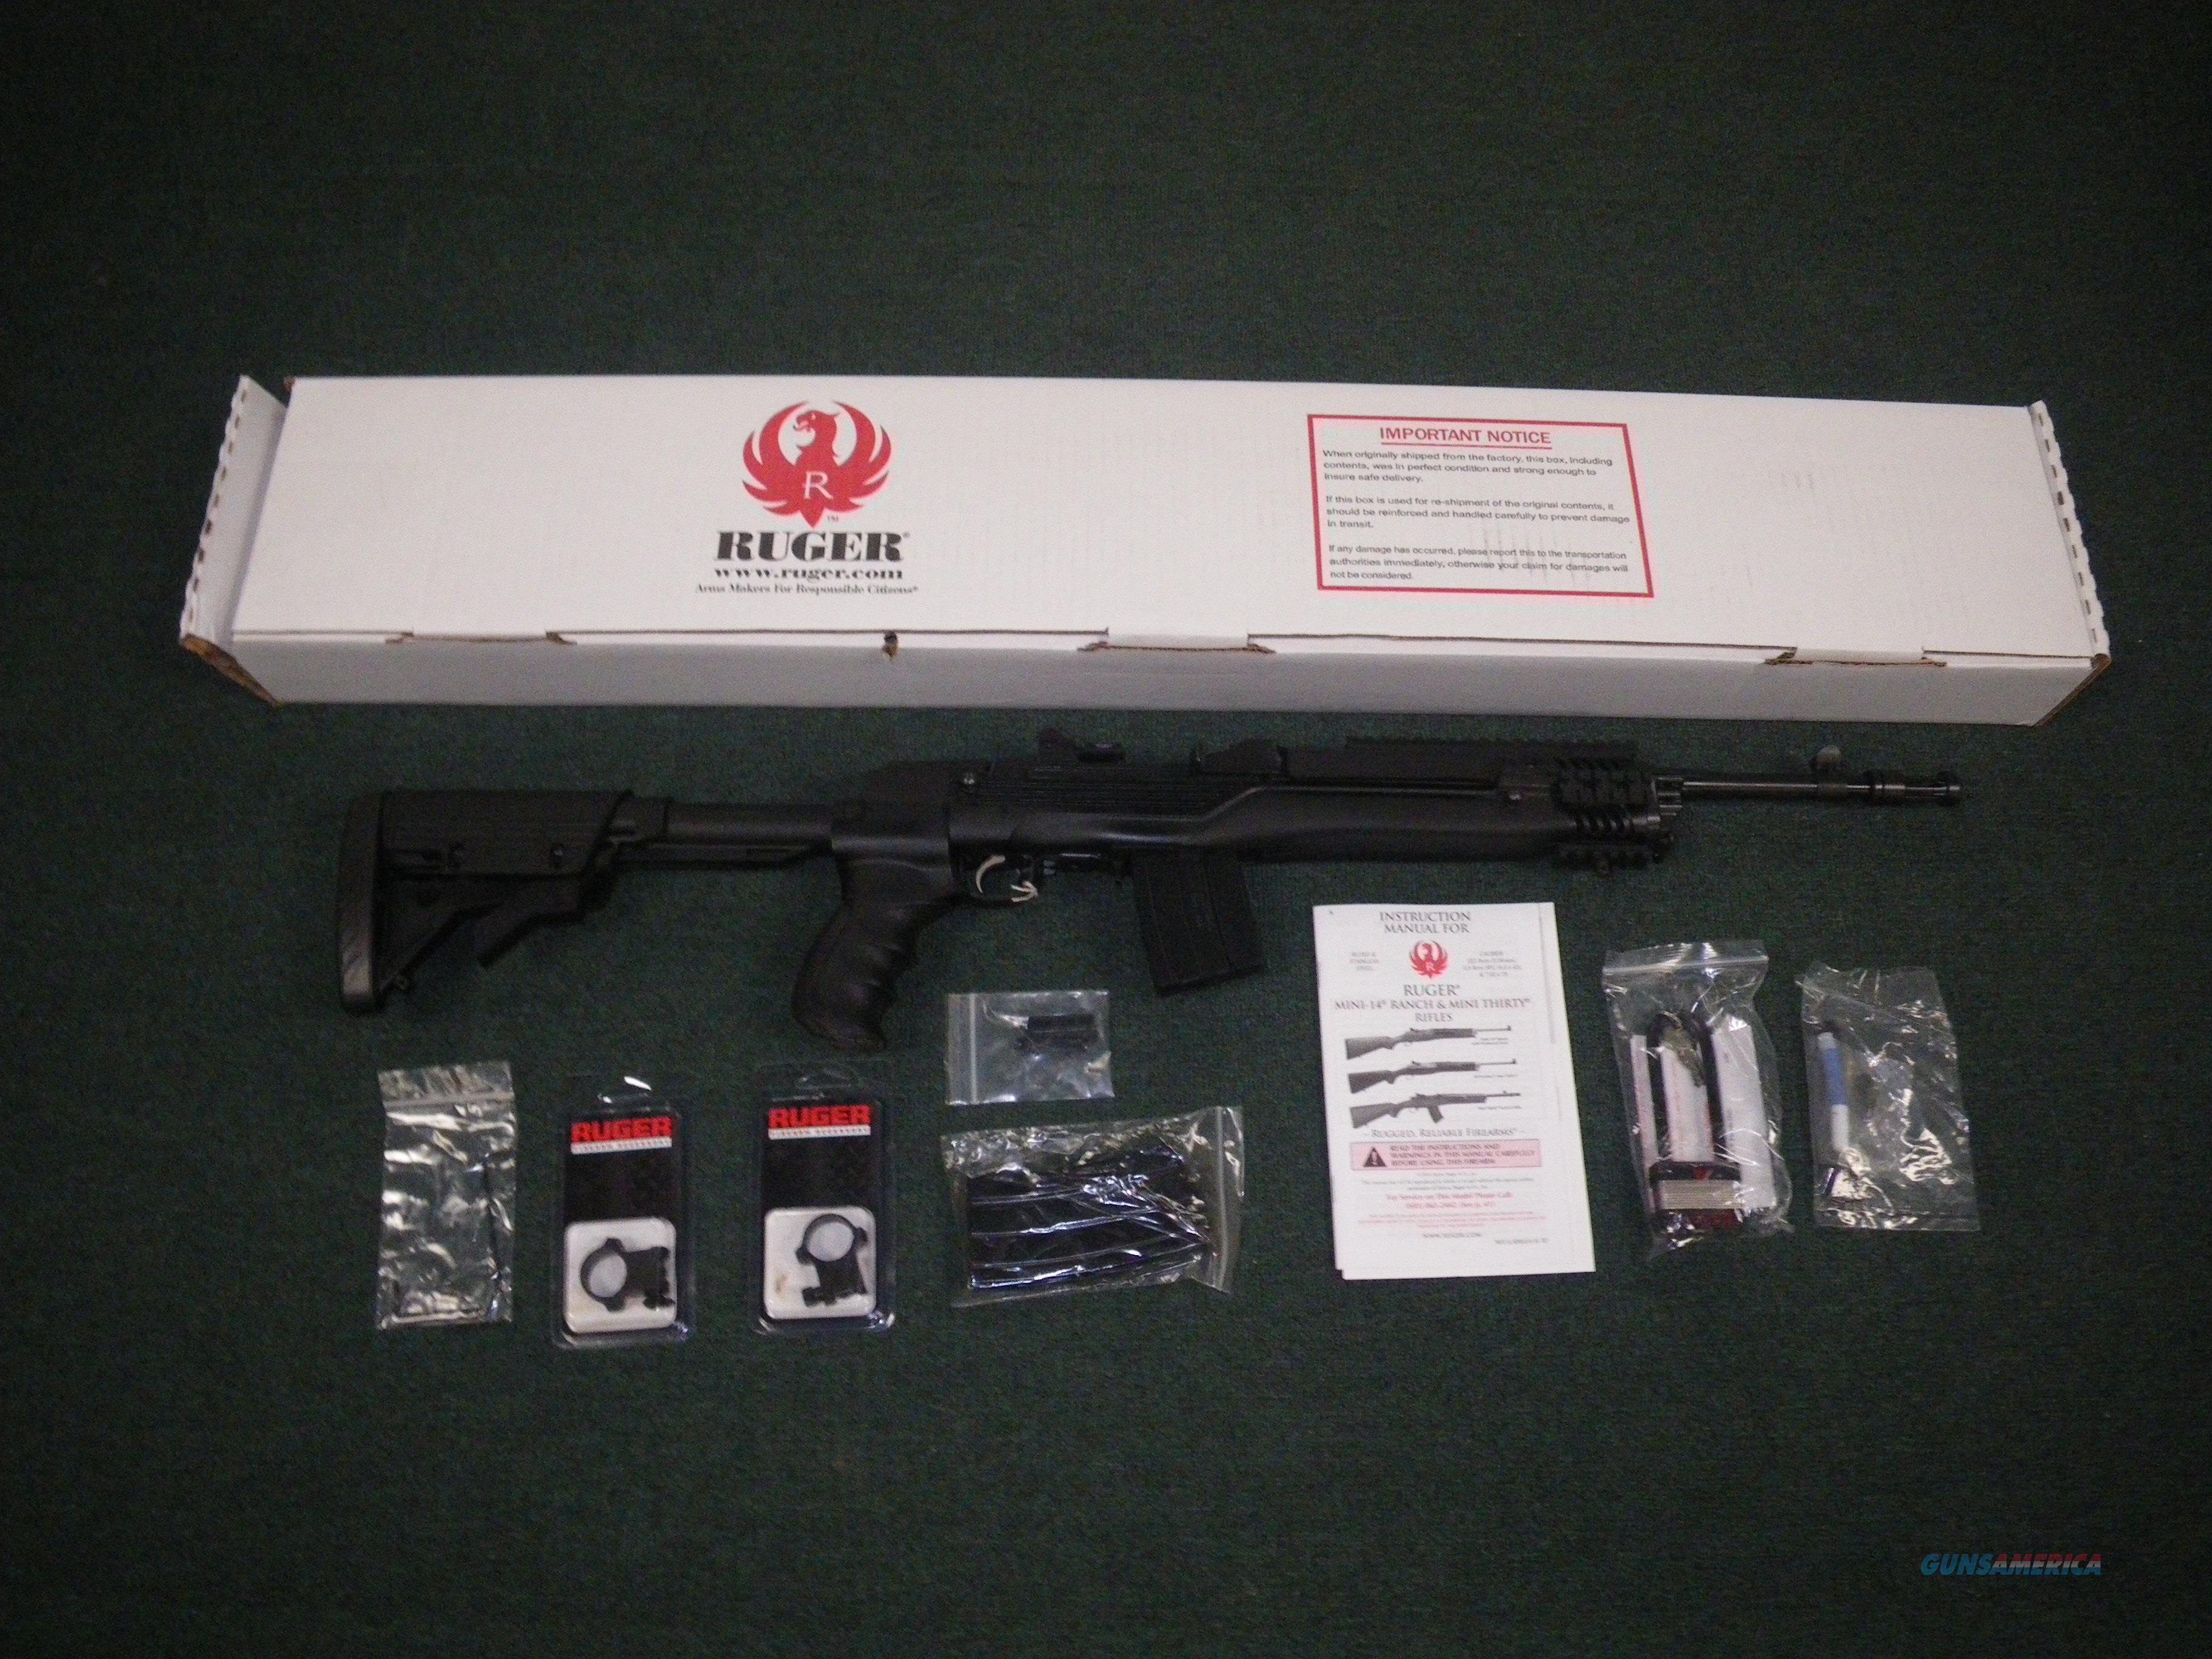 "Ruger Mini-14 Tactical ATI Stock 5.56/223 16"" NEW #5846  Guns > Rifles > Ruger Rifles > Mini-14 Type"